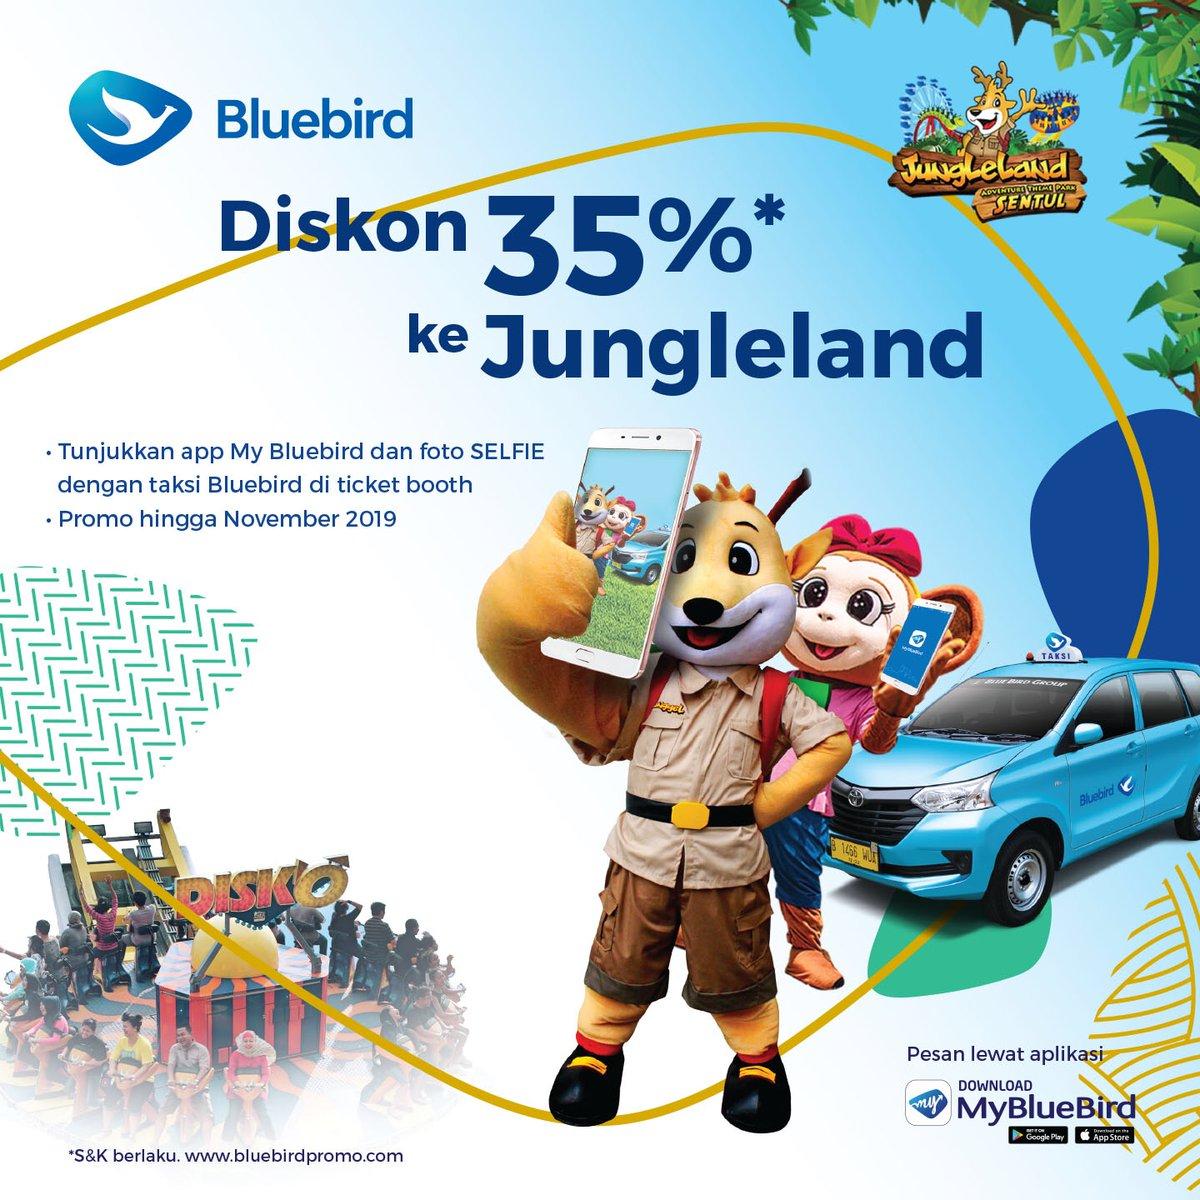 #Bluebird - #Promo Diskon 35% Tiket JungleLand Adventure Theme Park (s.d Nov 2019)